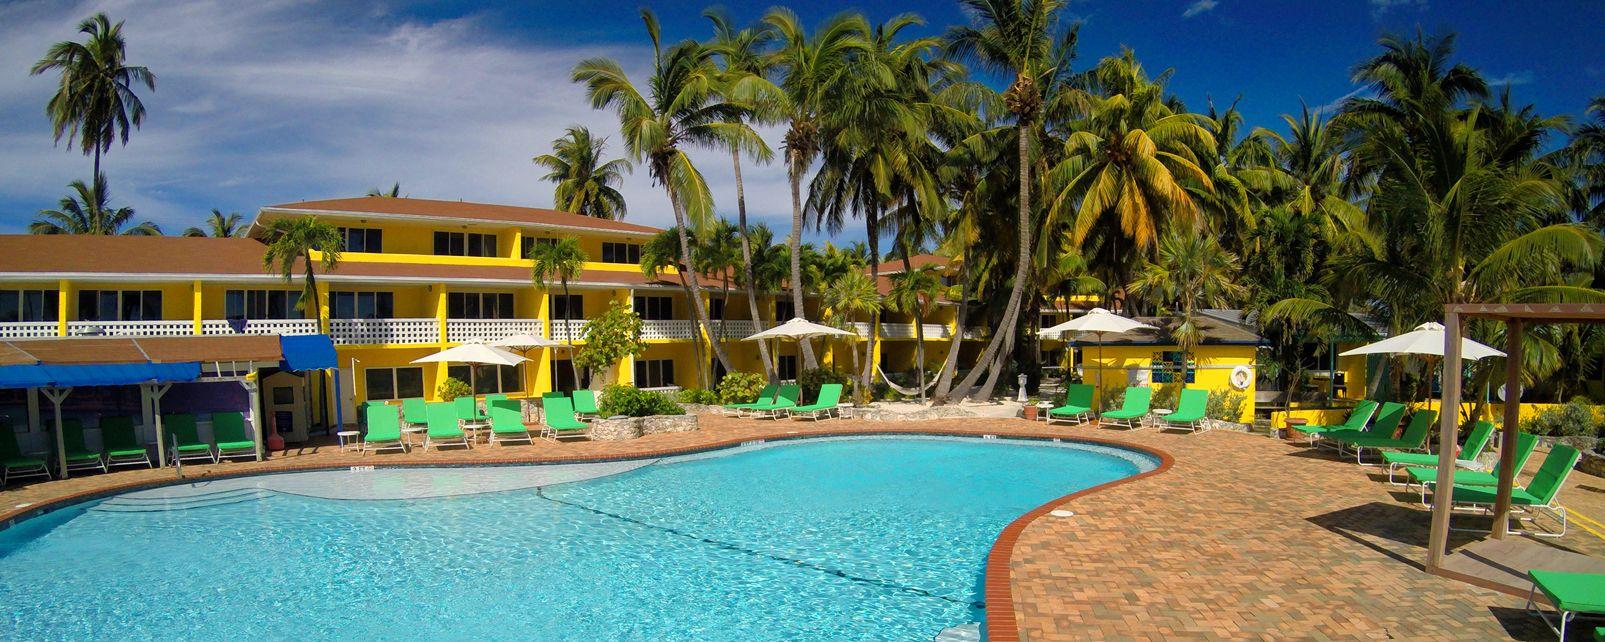 Hôtel Bimini Big Game Club Resort and Marina